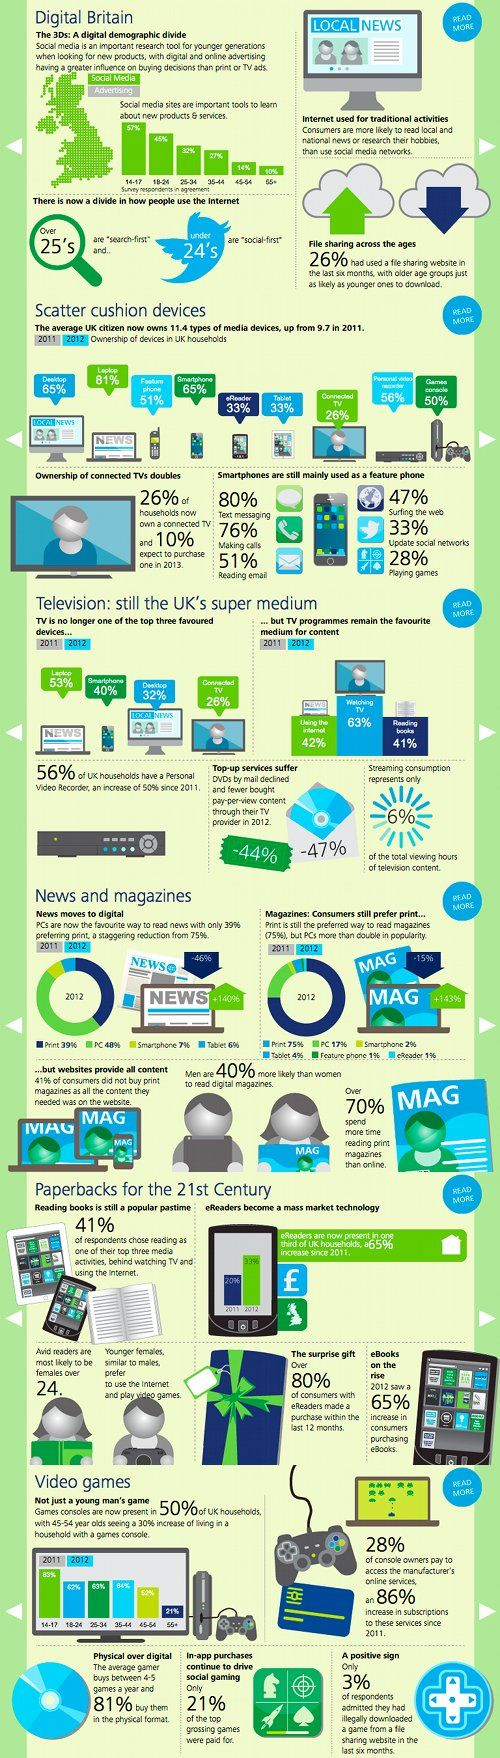 Deloitte's UK Media Consumer survey '13